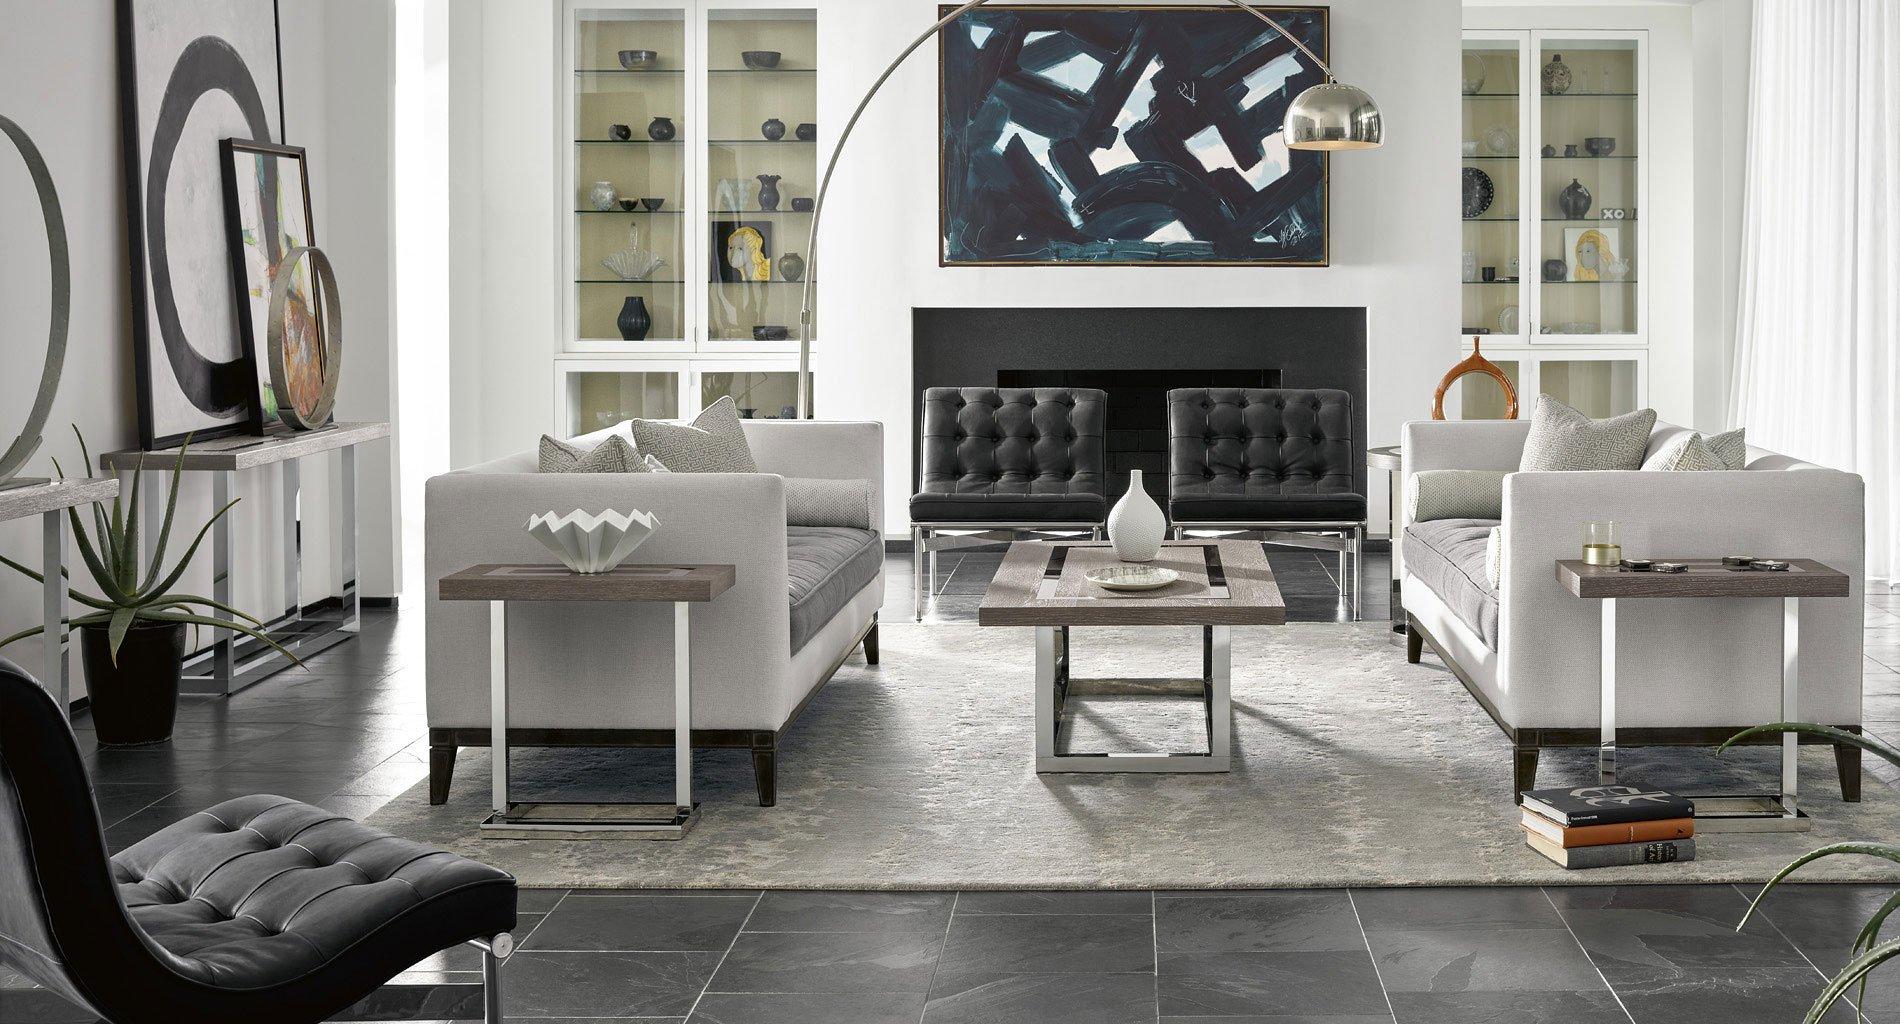 Flint Office Furniture: Modern Wyatt Occasional Table Set (Flint) Universal